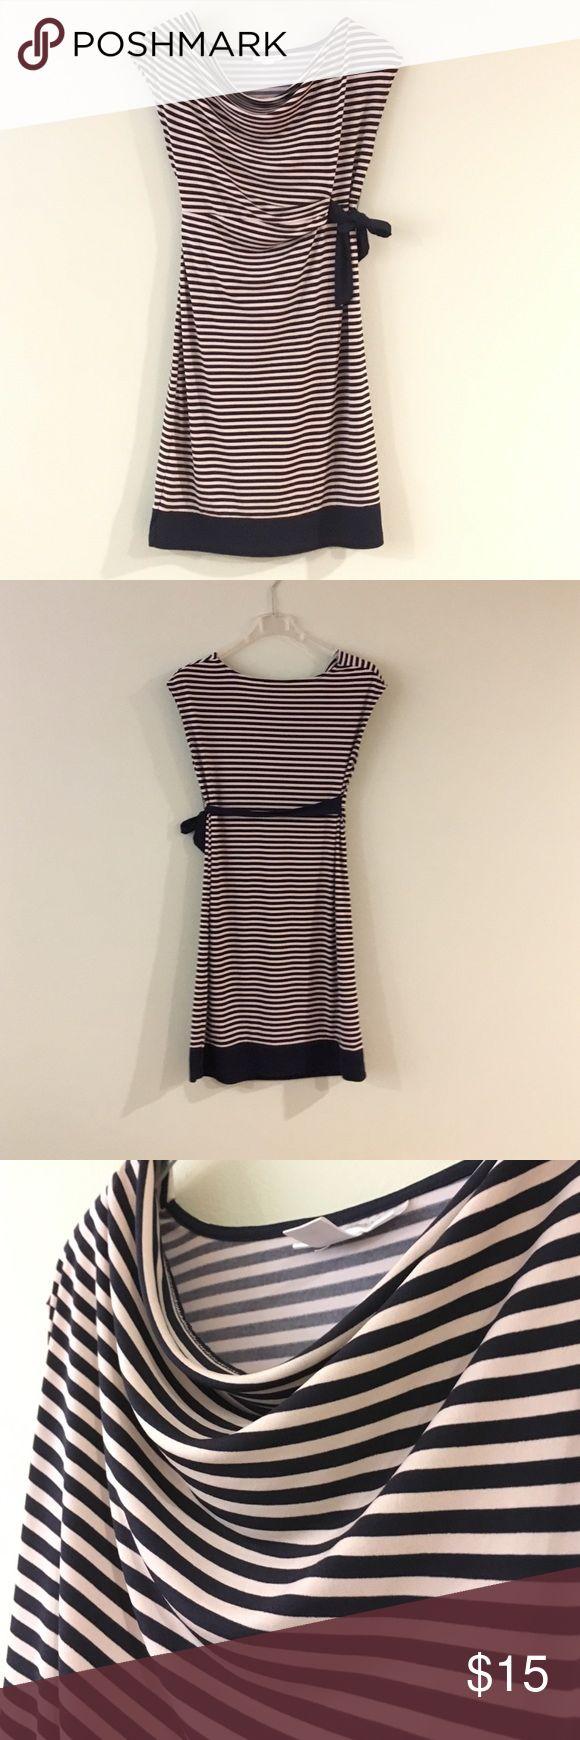 Striped maternity dress. Zebra striped maternity dress. Knee length, good condition. Motherhood Maternity Dresses Midi